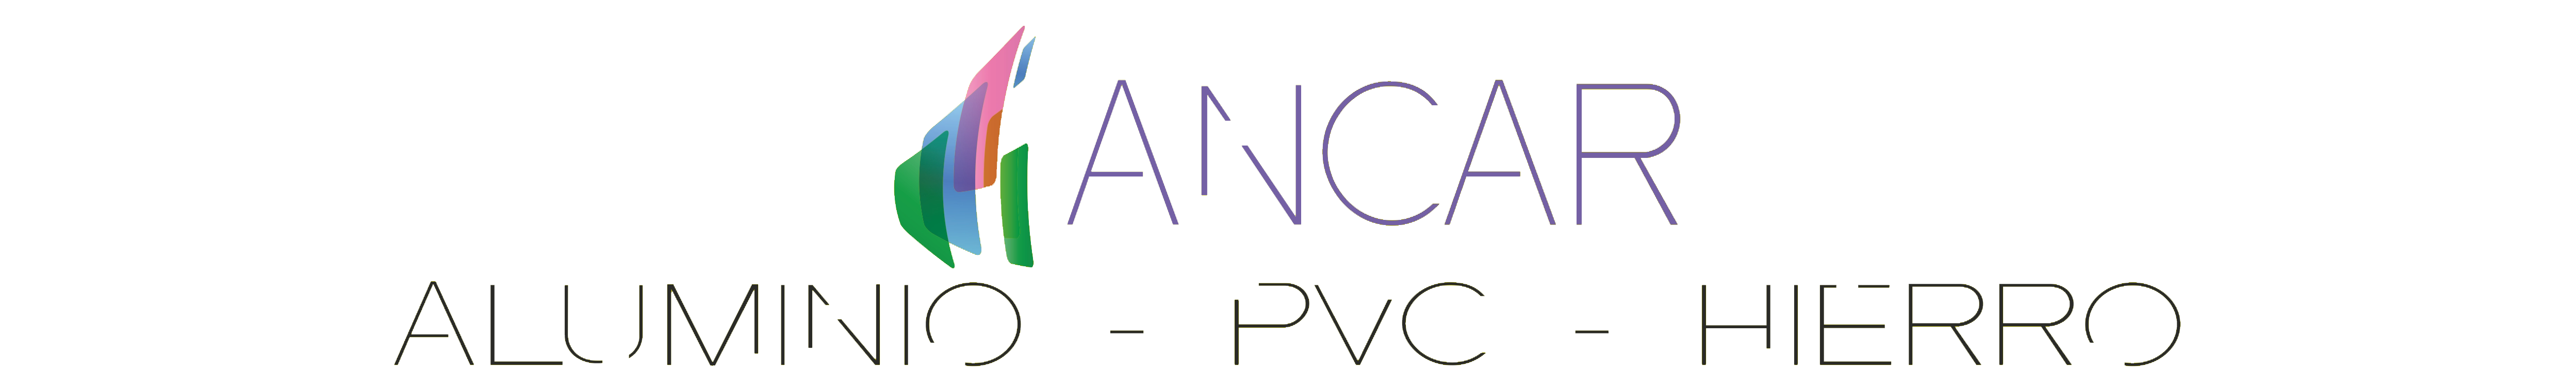 Ancar Aluminio-PVC